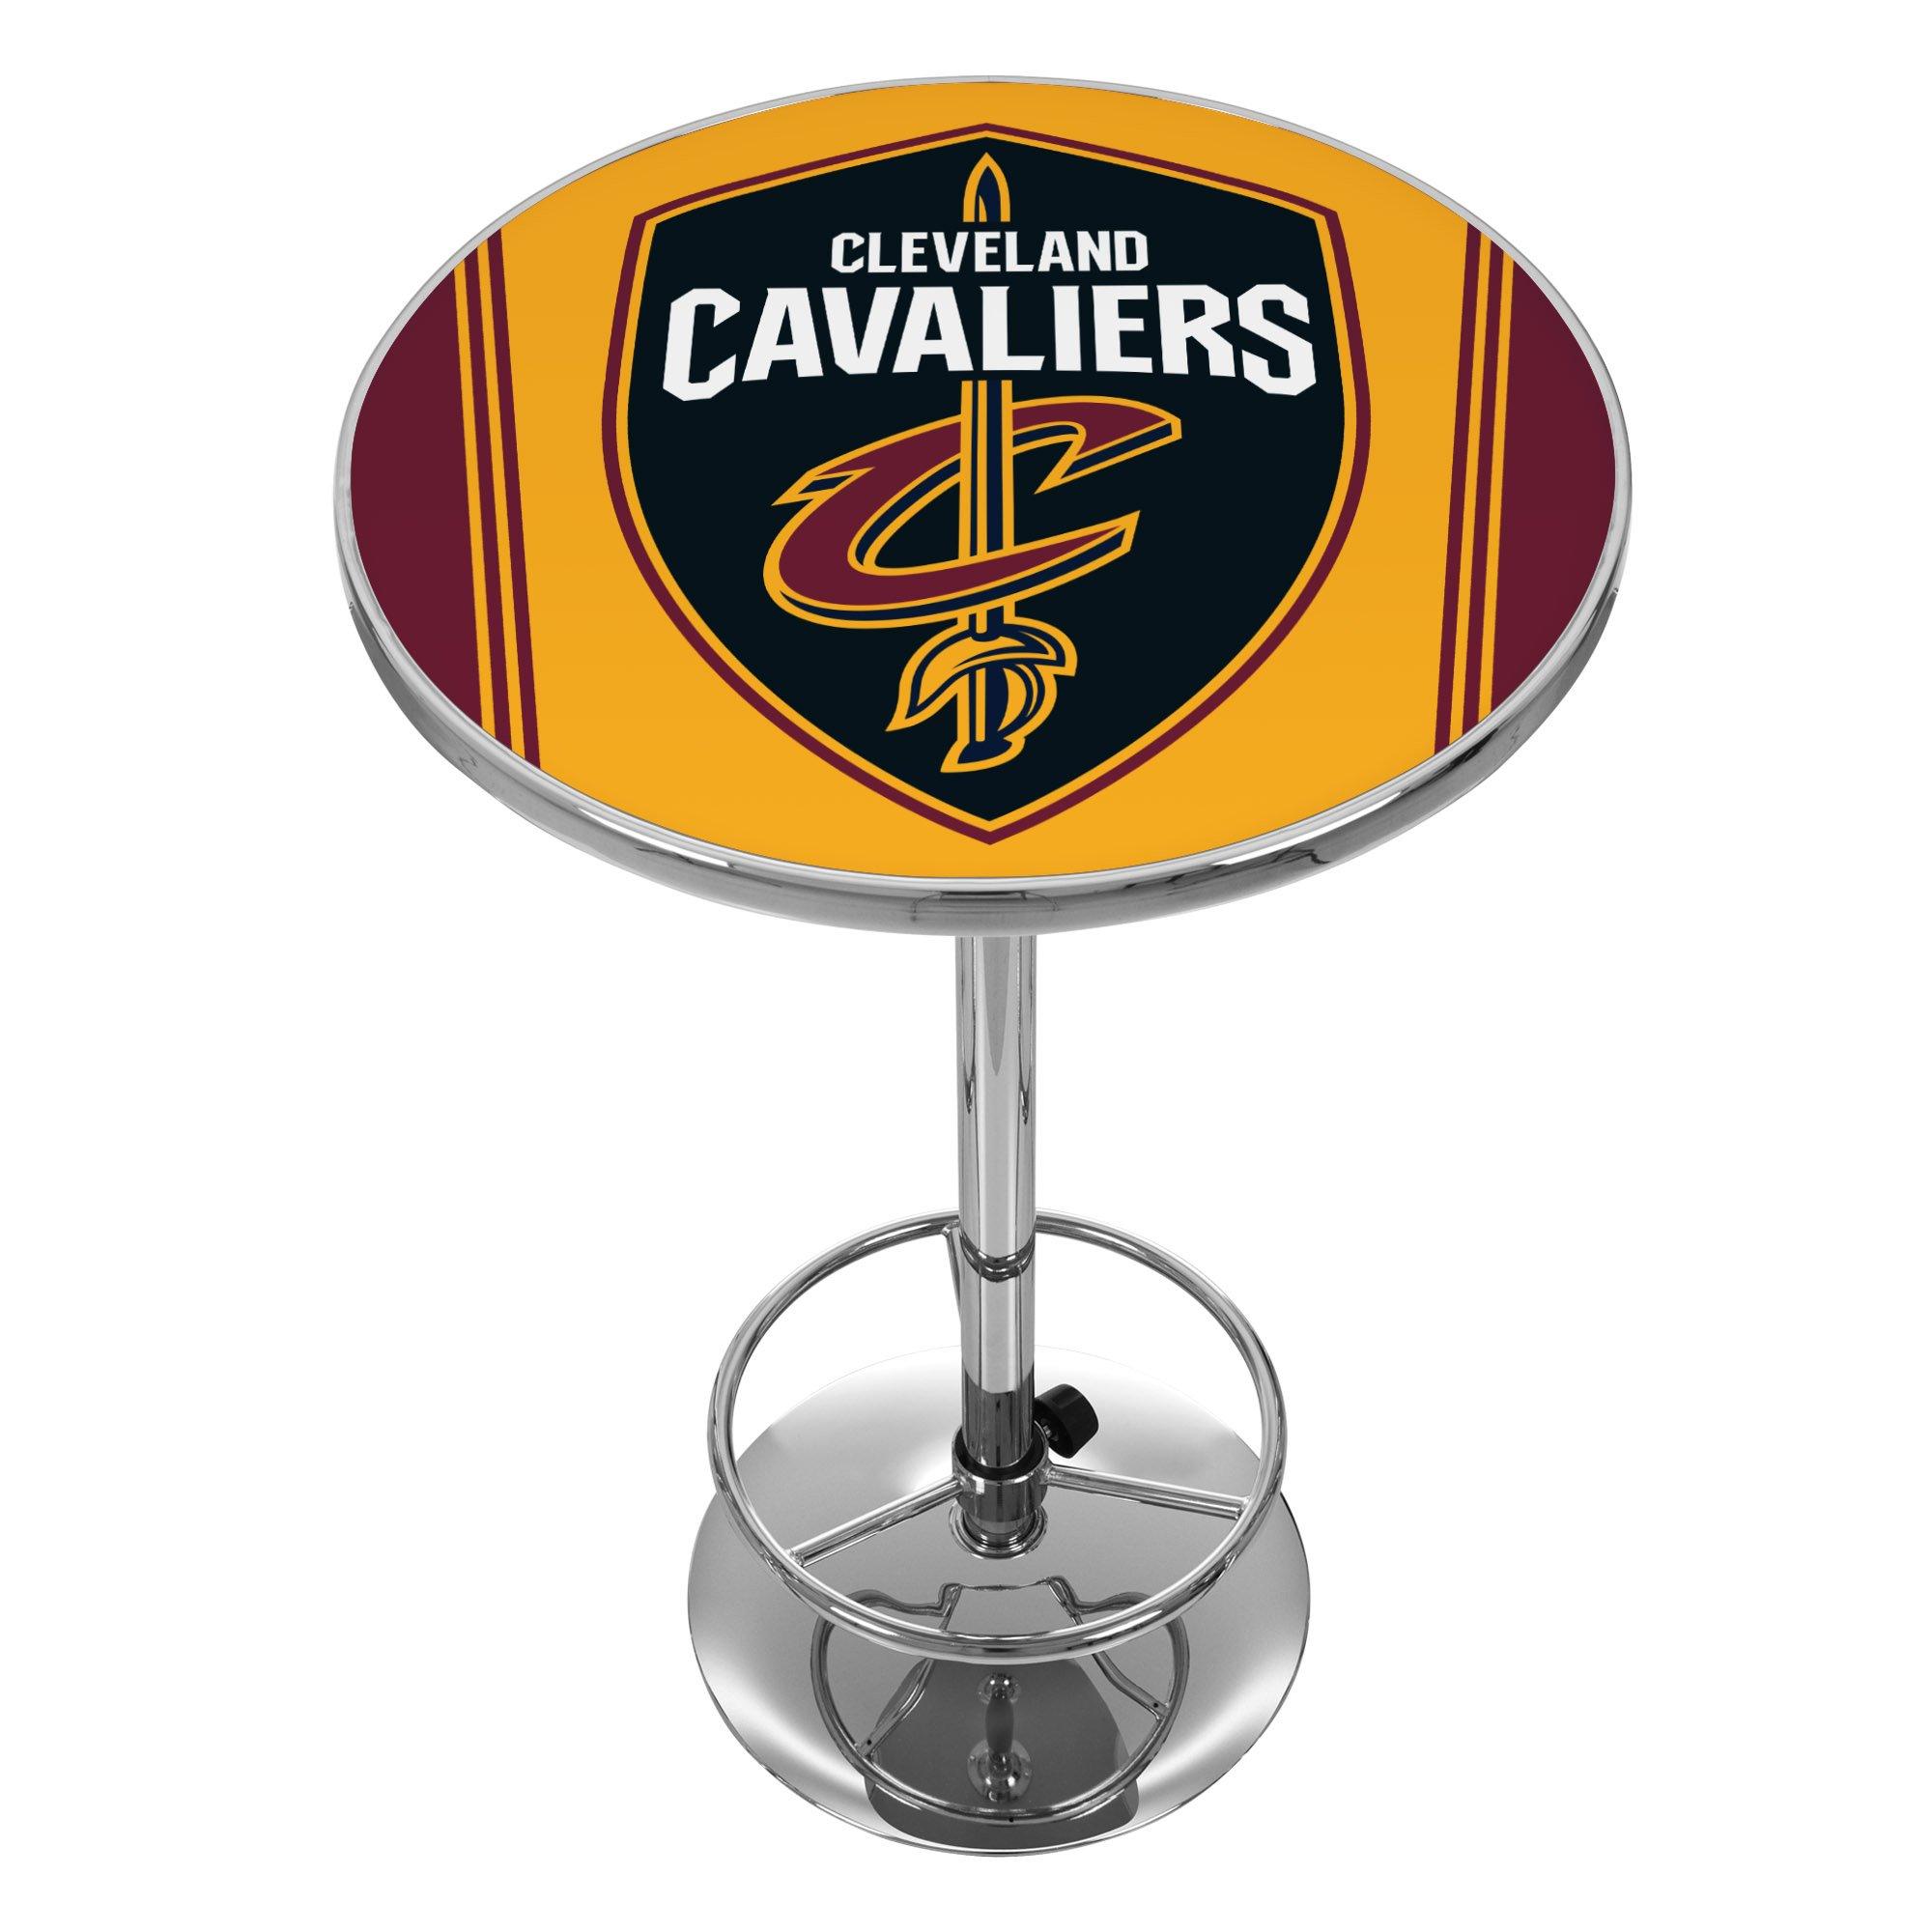 NBA Cleveland Cavaliers Chrome Pub Table